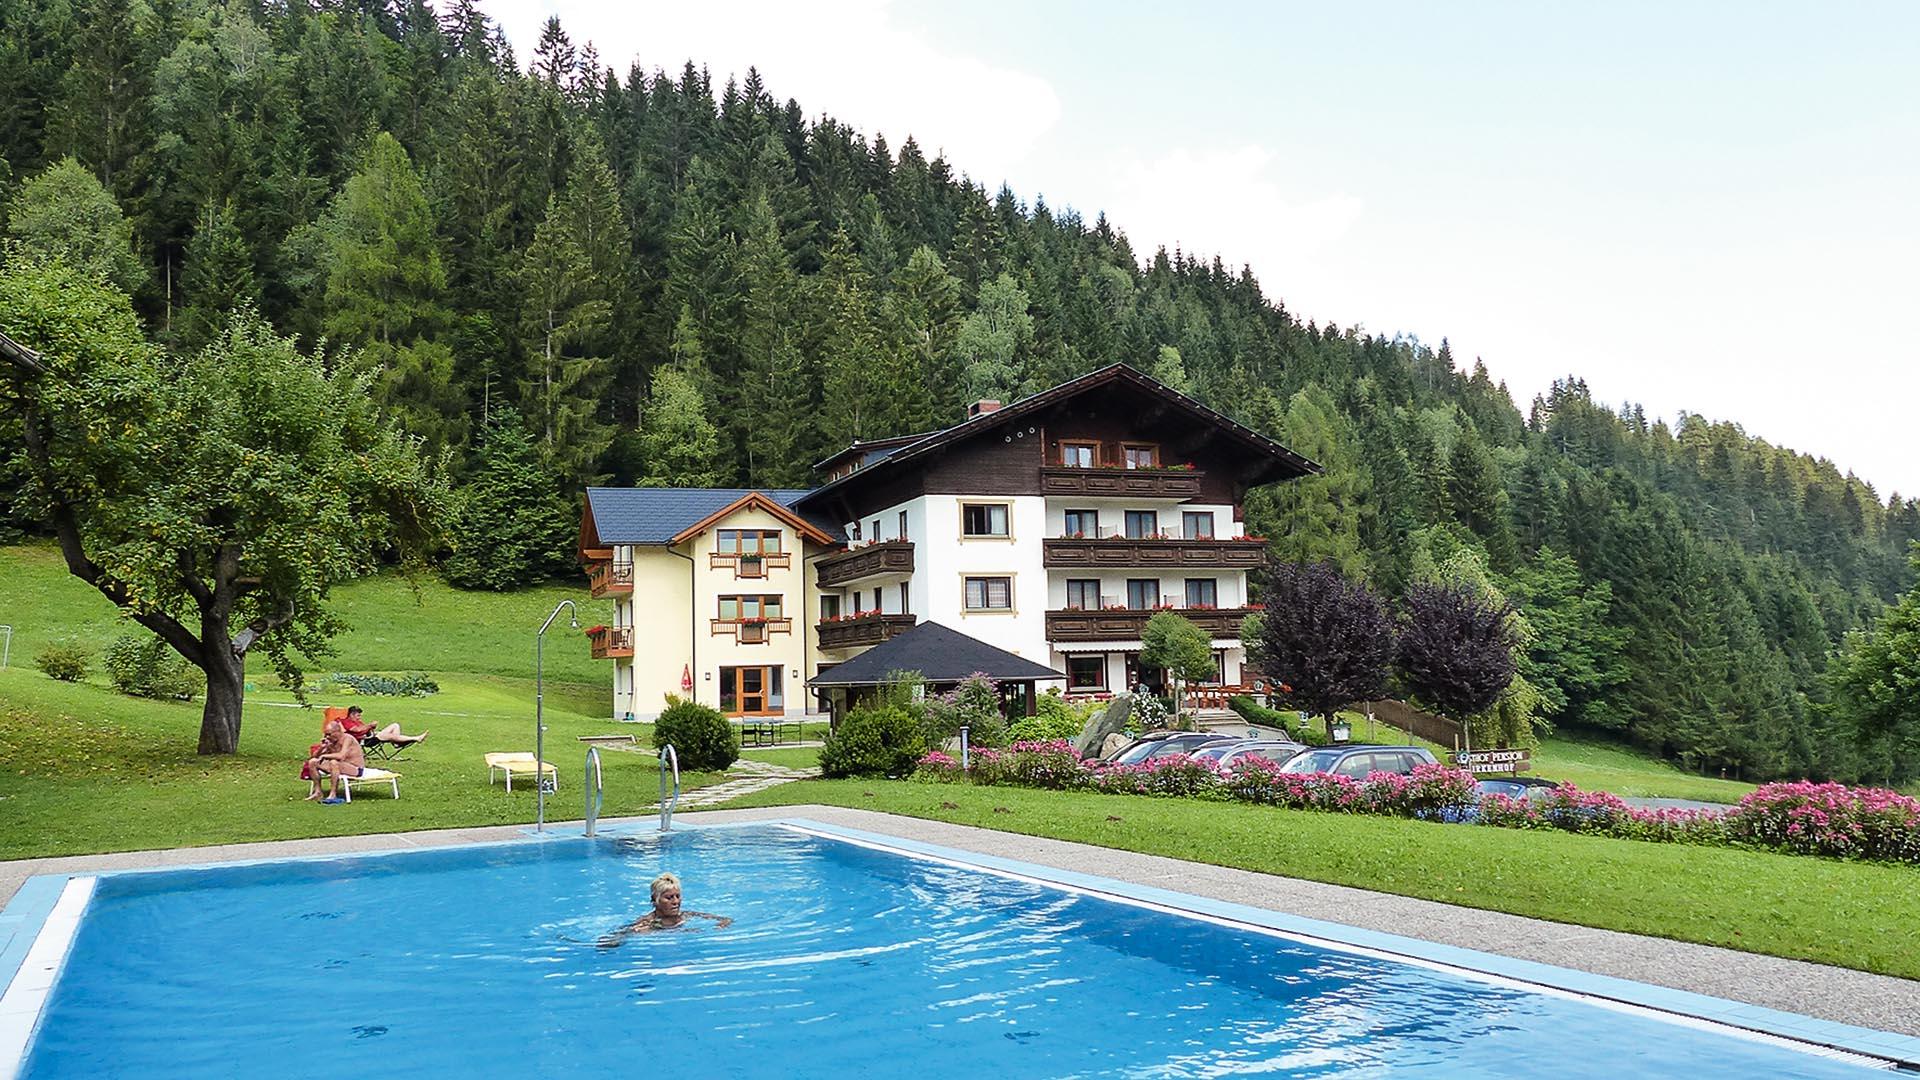 Hotel-Pension Birkenhof